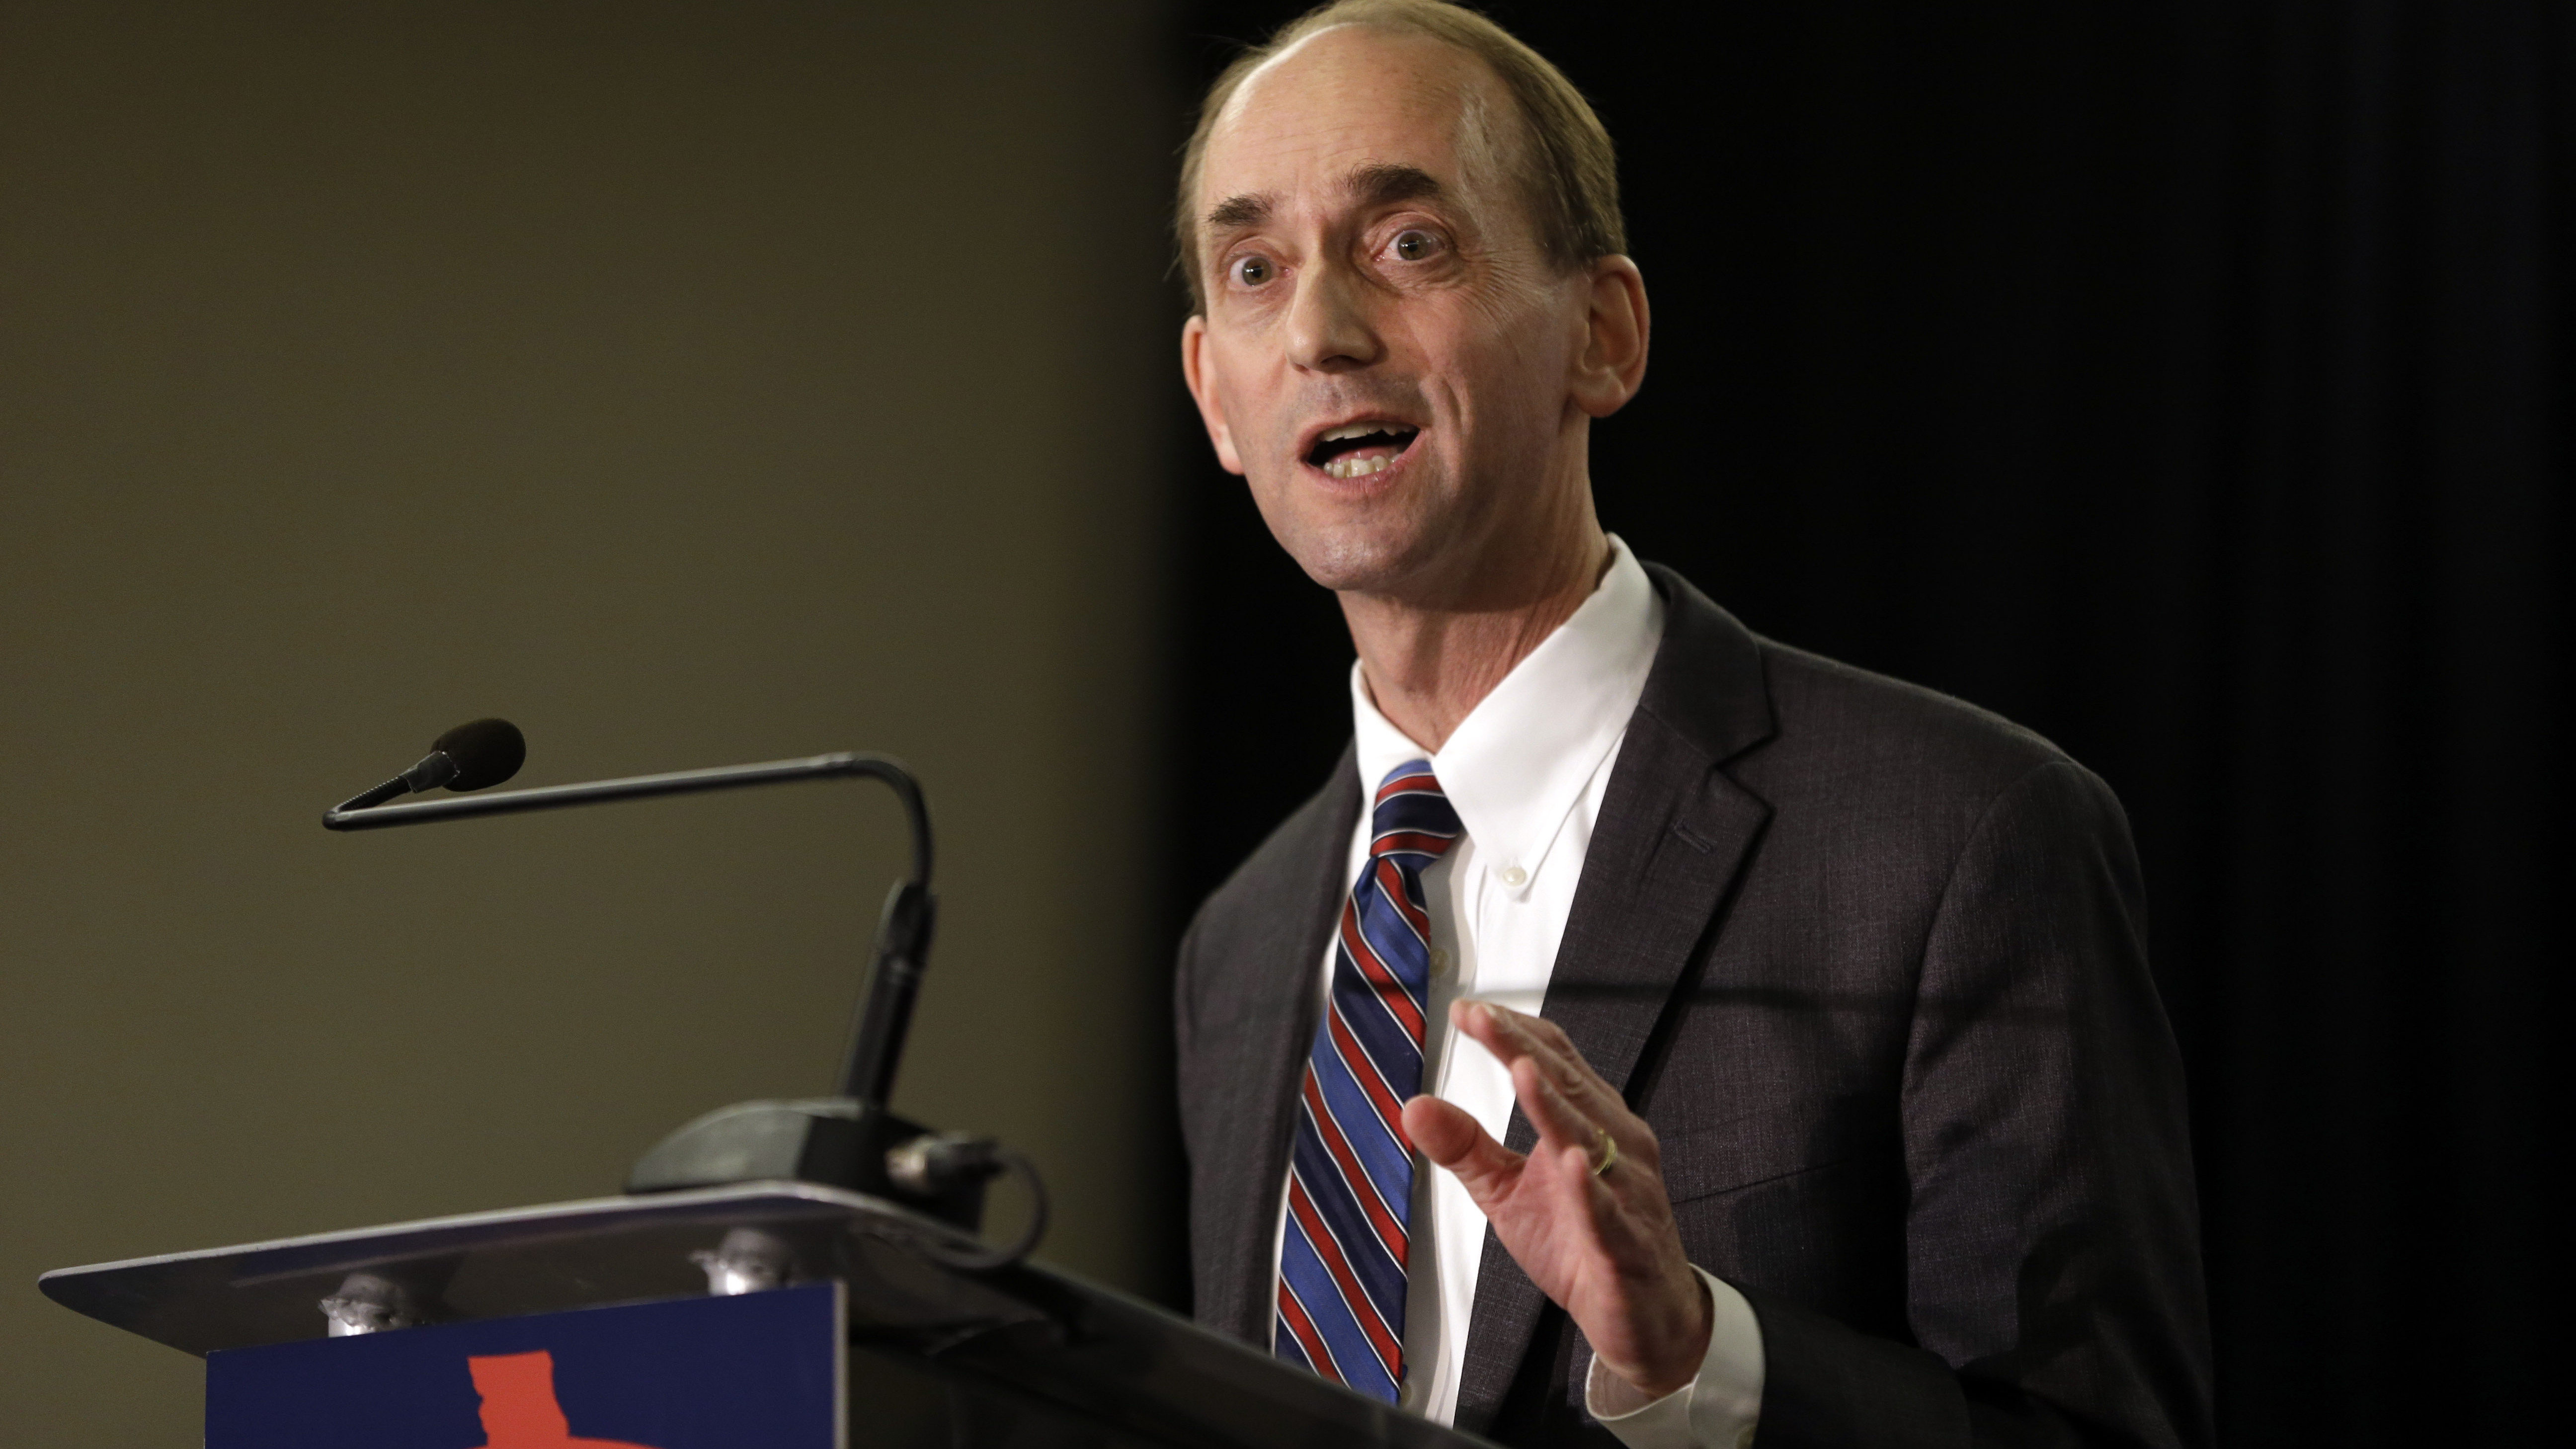 Suicides By Missouri Politicians Raise Questions About State Ethics